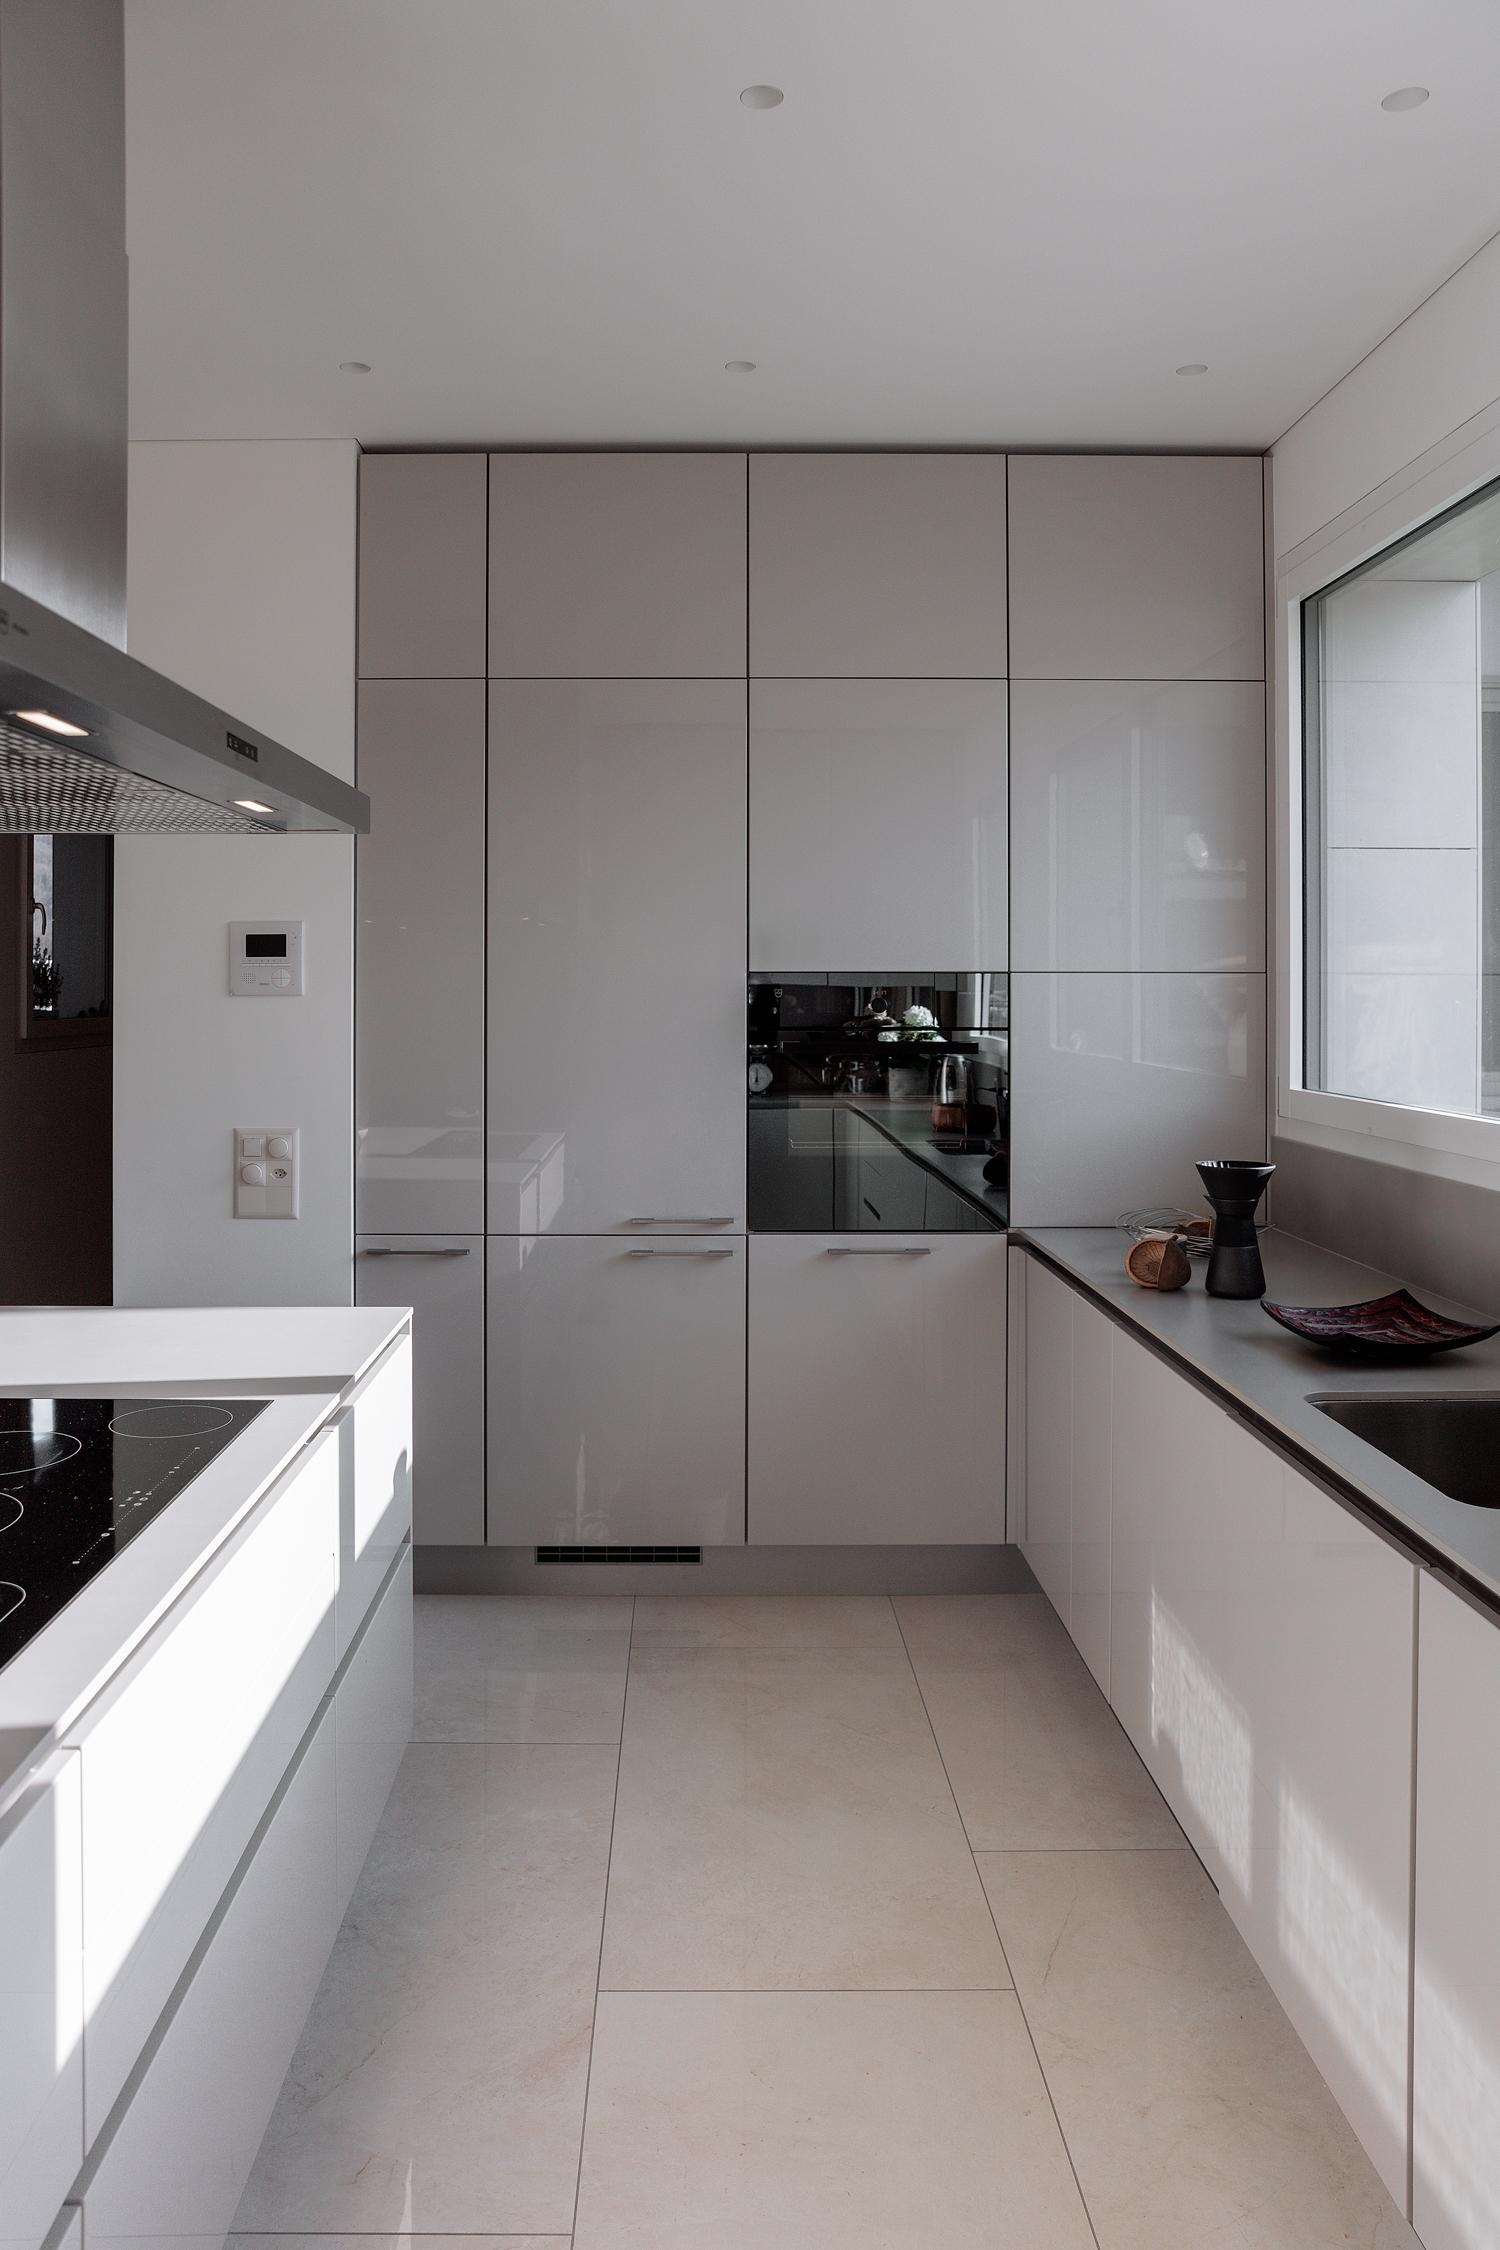 01 cucina 2